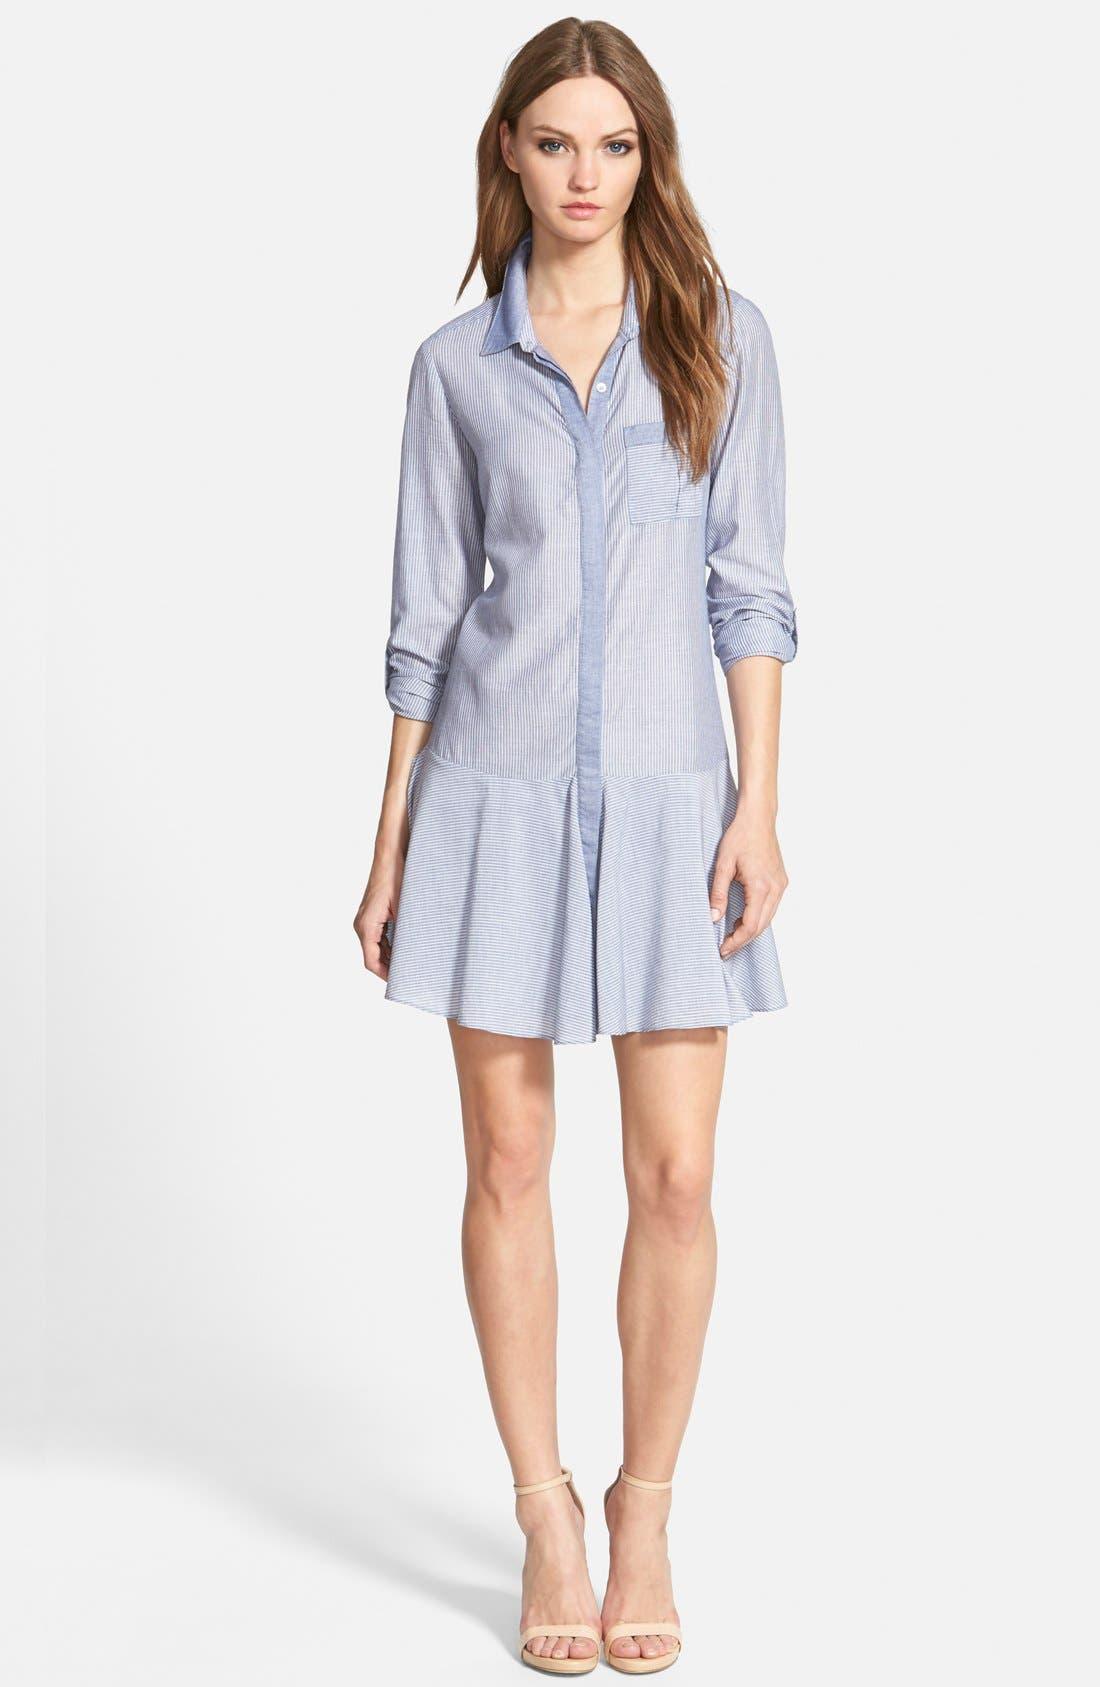 Alternate Image 1 Selected - Sam Edelman Drop Waist Shirtdress